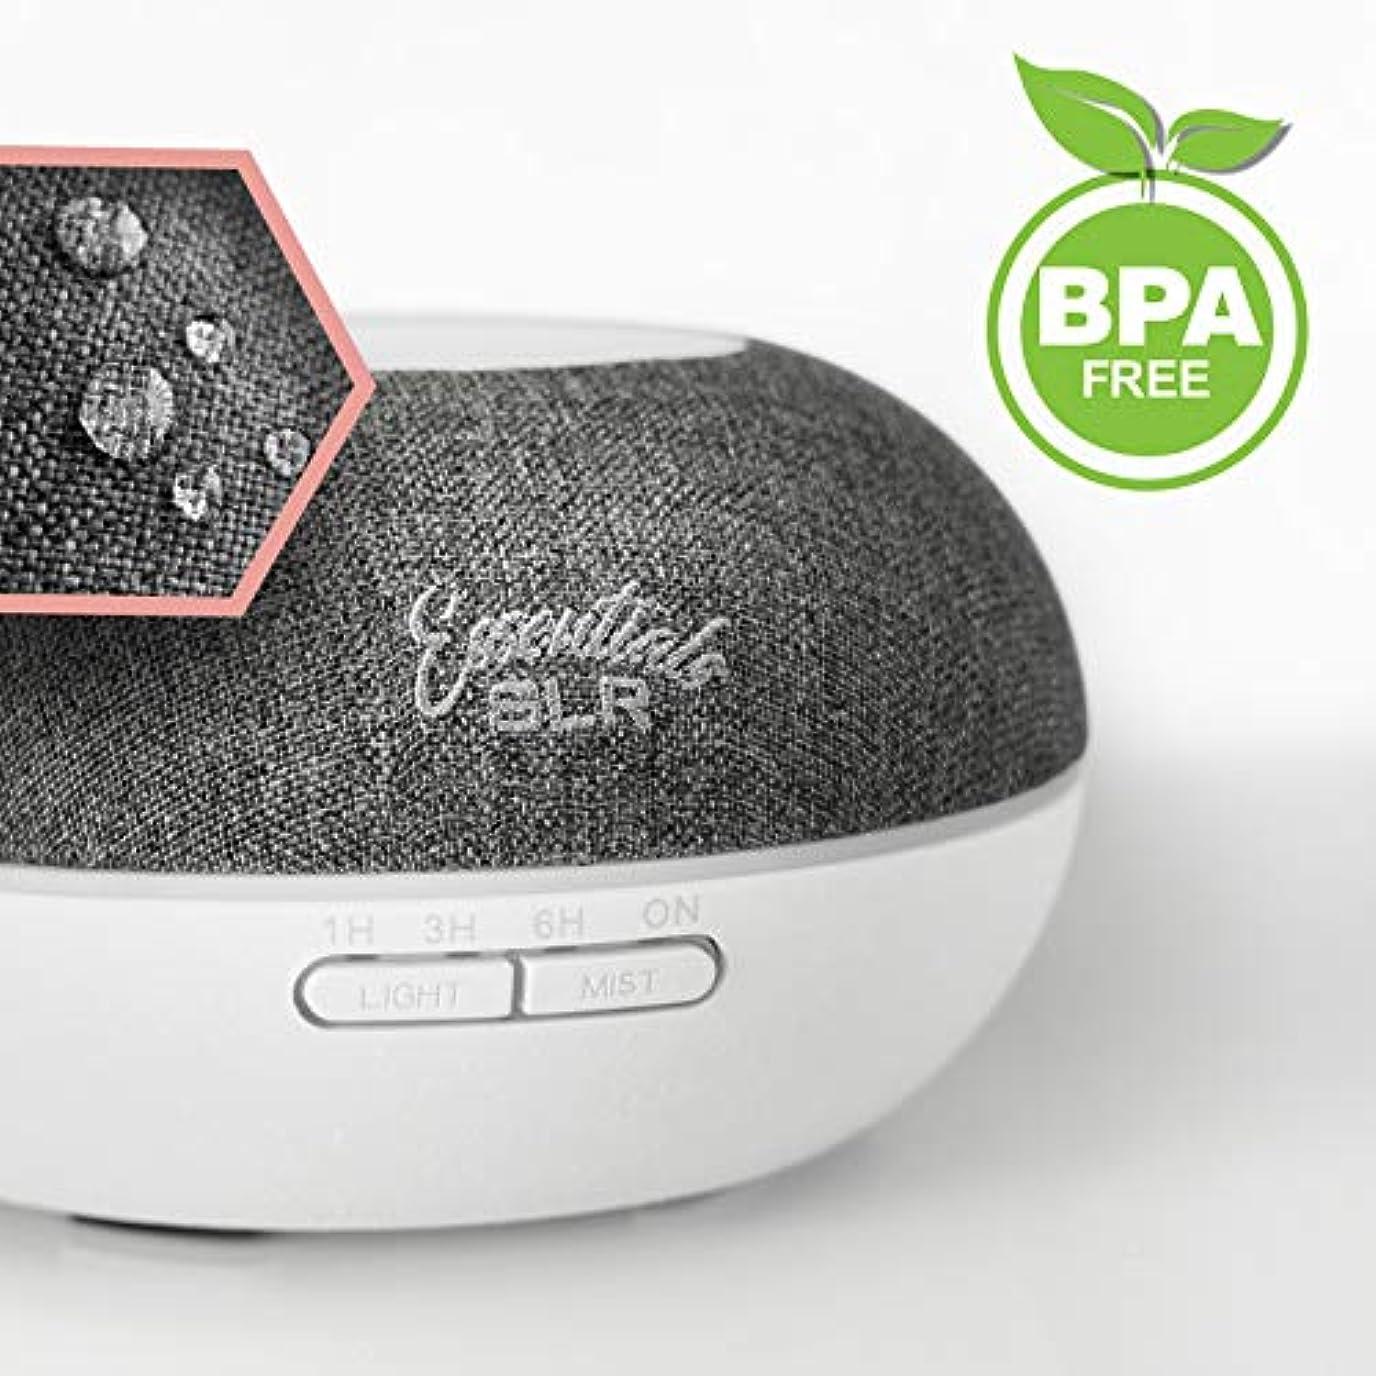 SLR 500 ml Aromatherapy Essential Oil Large Diffuser BPAフリー超音波空気加湿器withマルチカラー変更LED、自動遮断 500ml SLR:900-00055